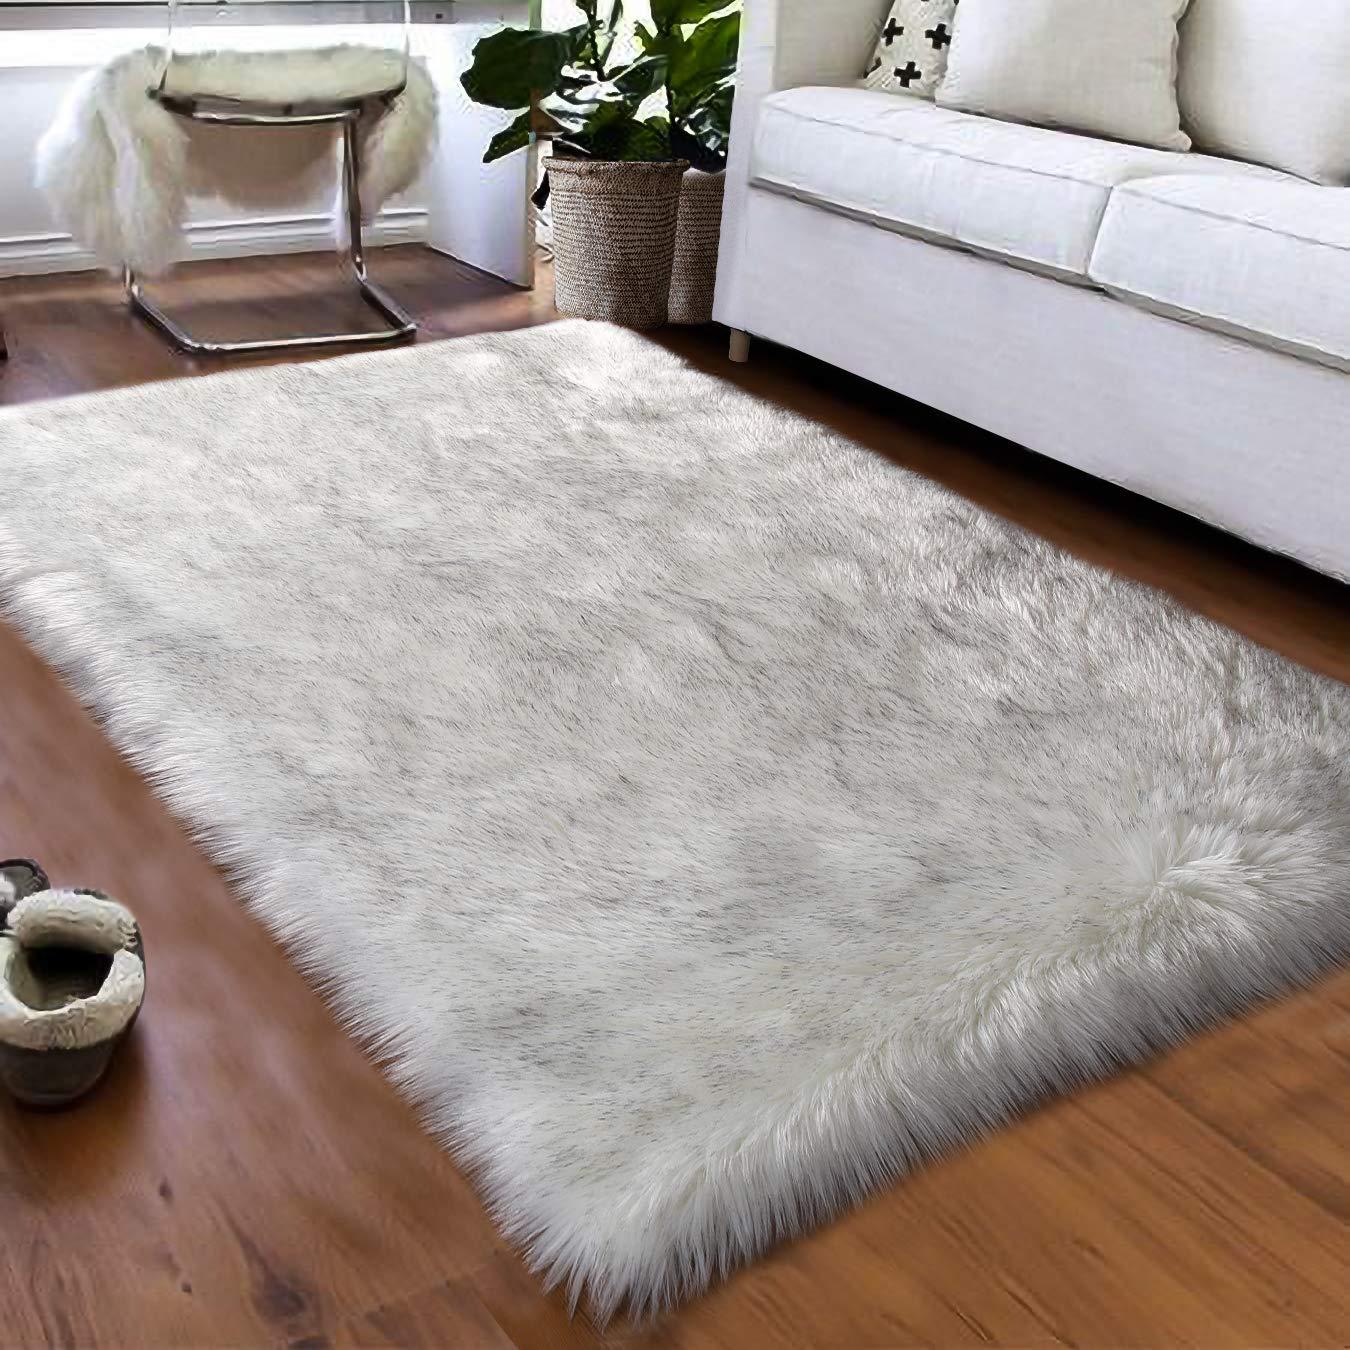 Softlife Faux Fur Sheepskin Area Rugs Shaggy Wool Carpet for Girls Room Bedroom Living Room Home Decor Rug (3ft x 5ft, White-Grey Tip)